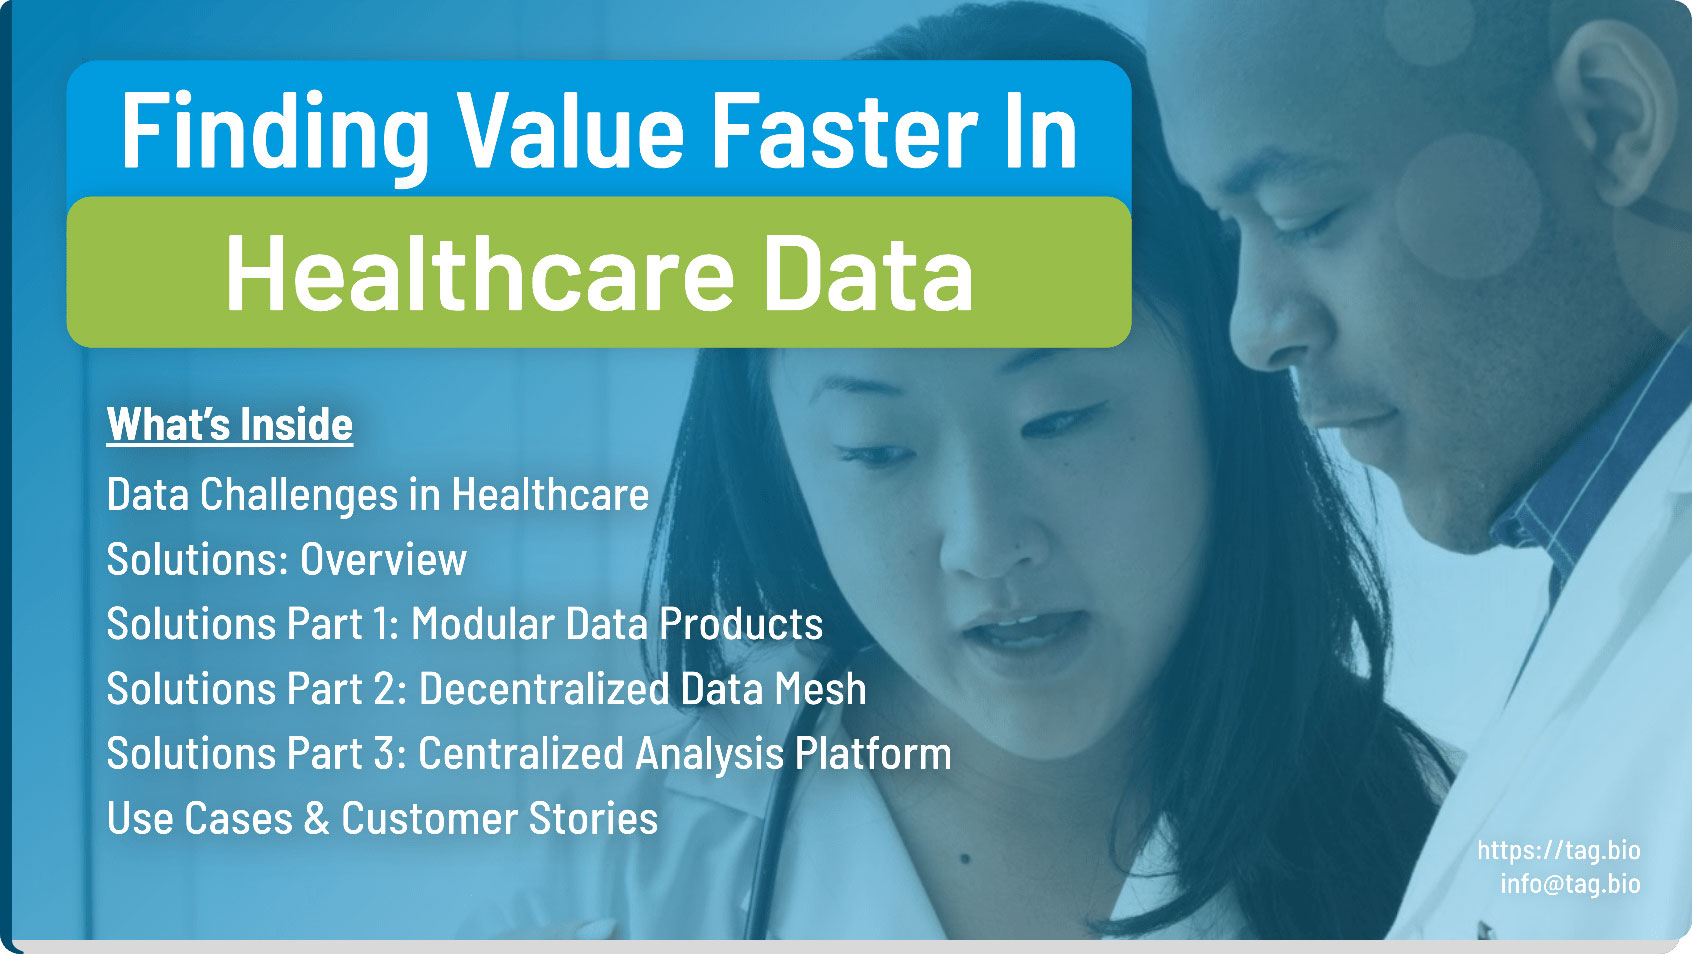 tag.bio healthcare analysis platform ebook